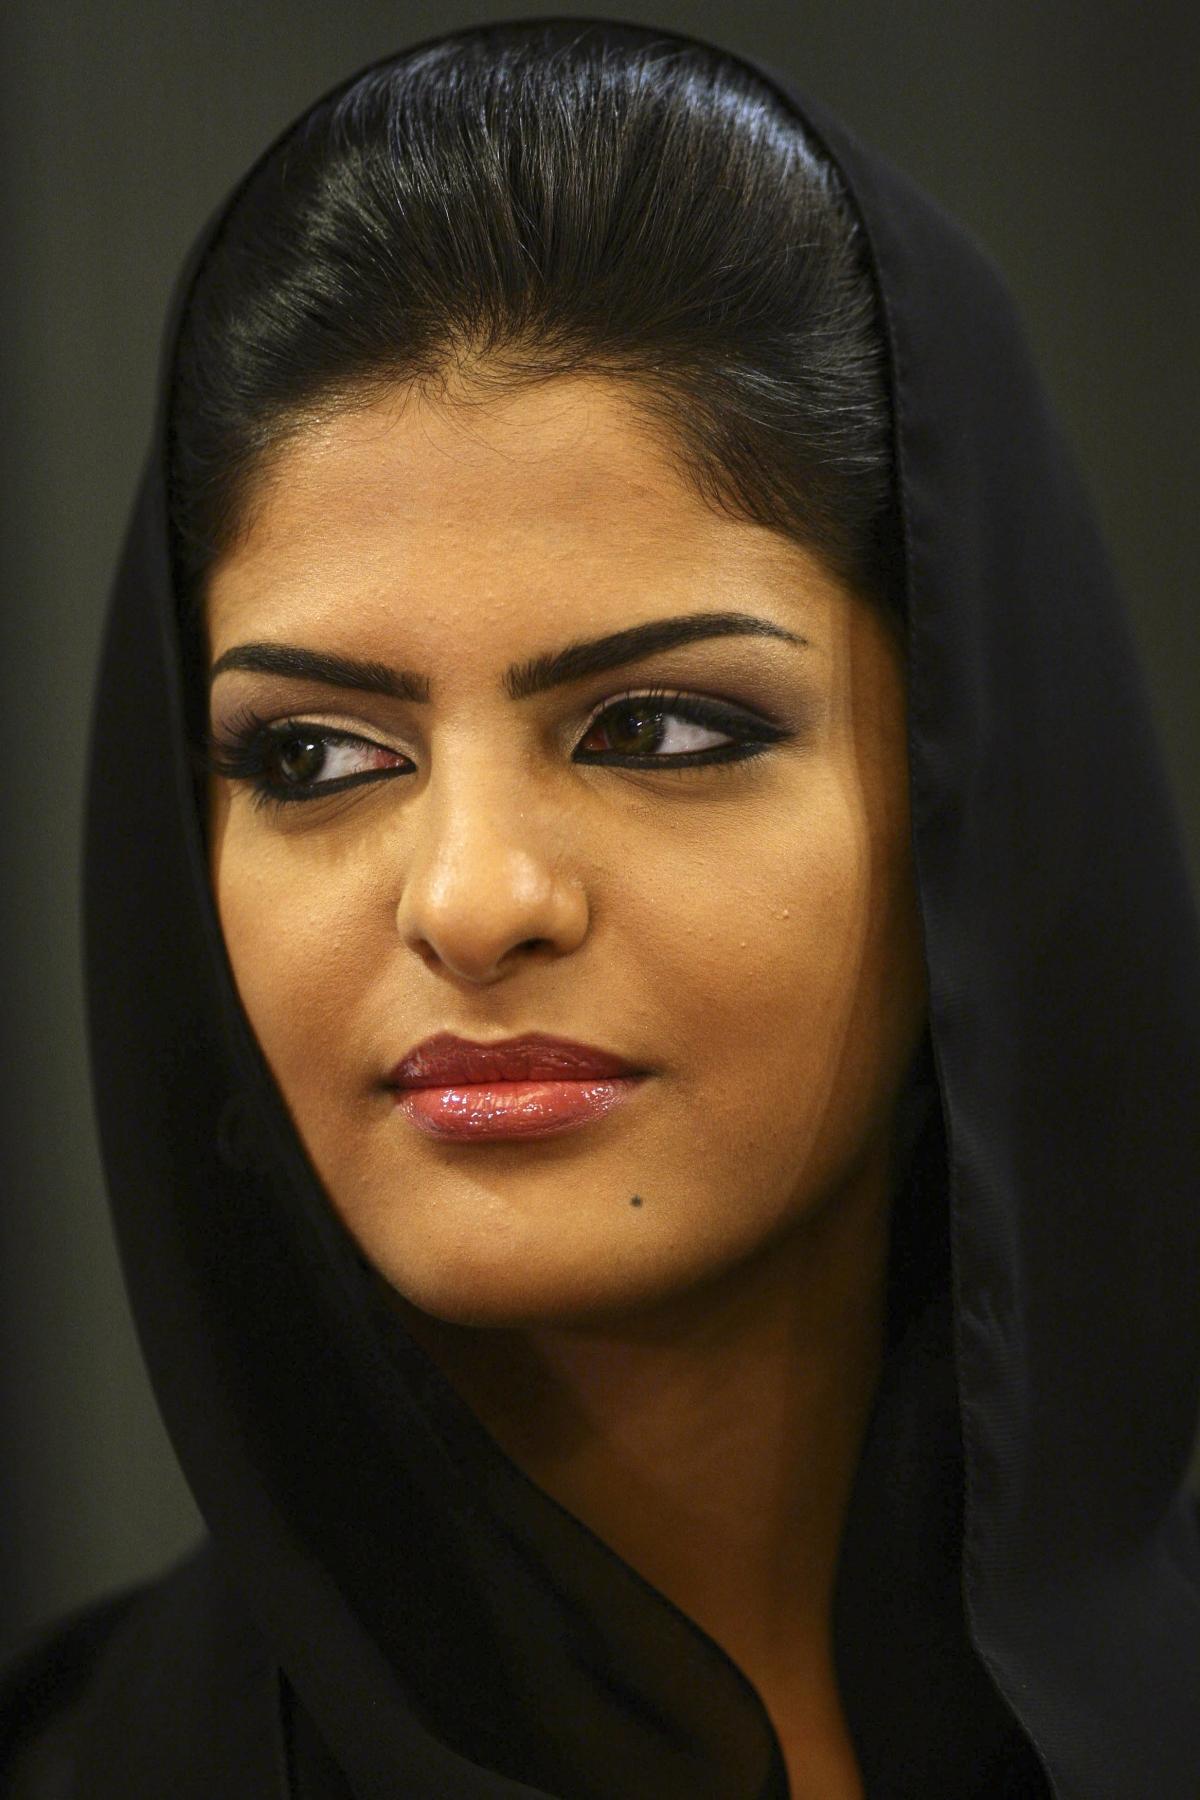 Princess Amira al-Taweel